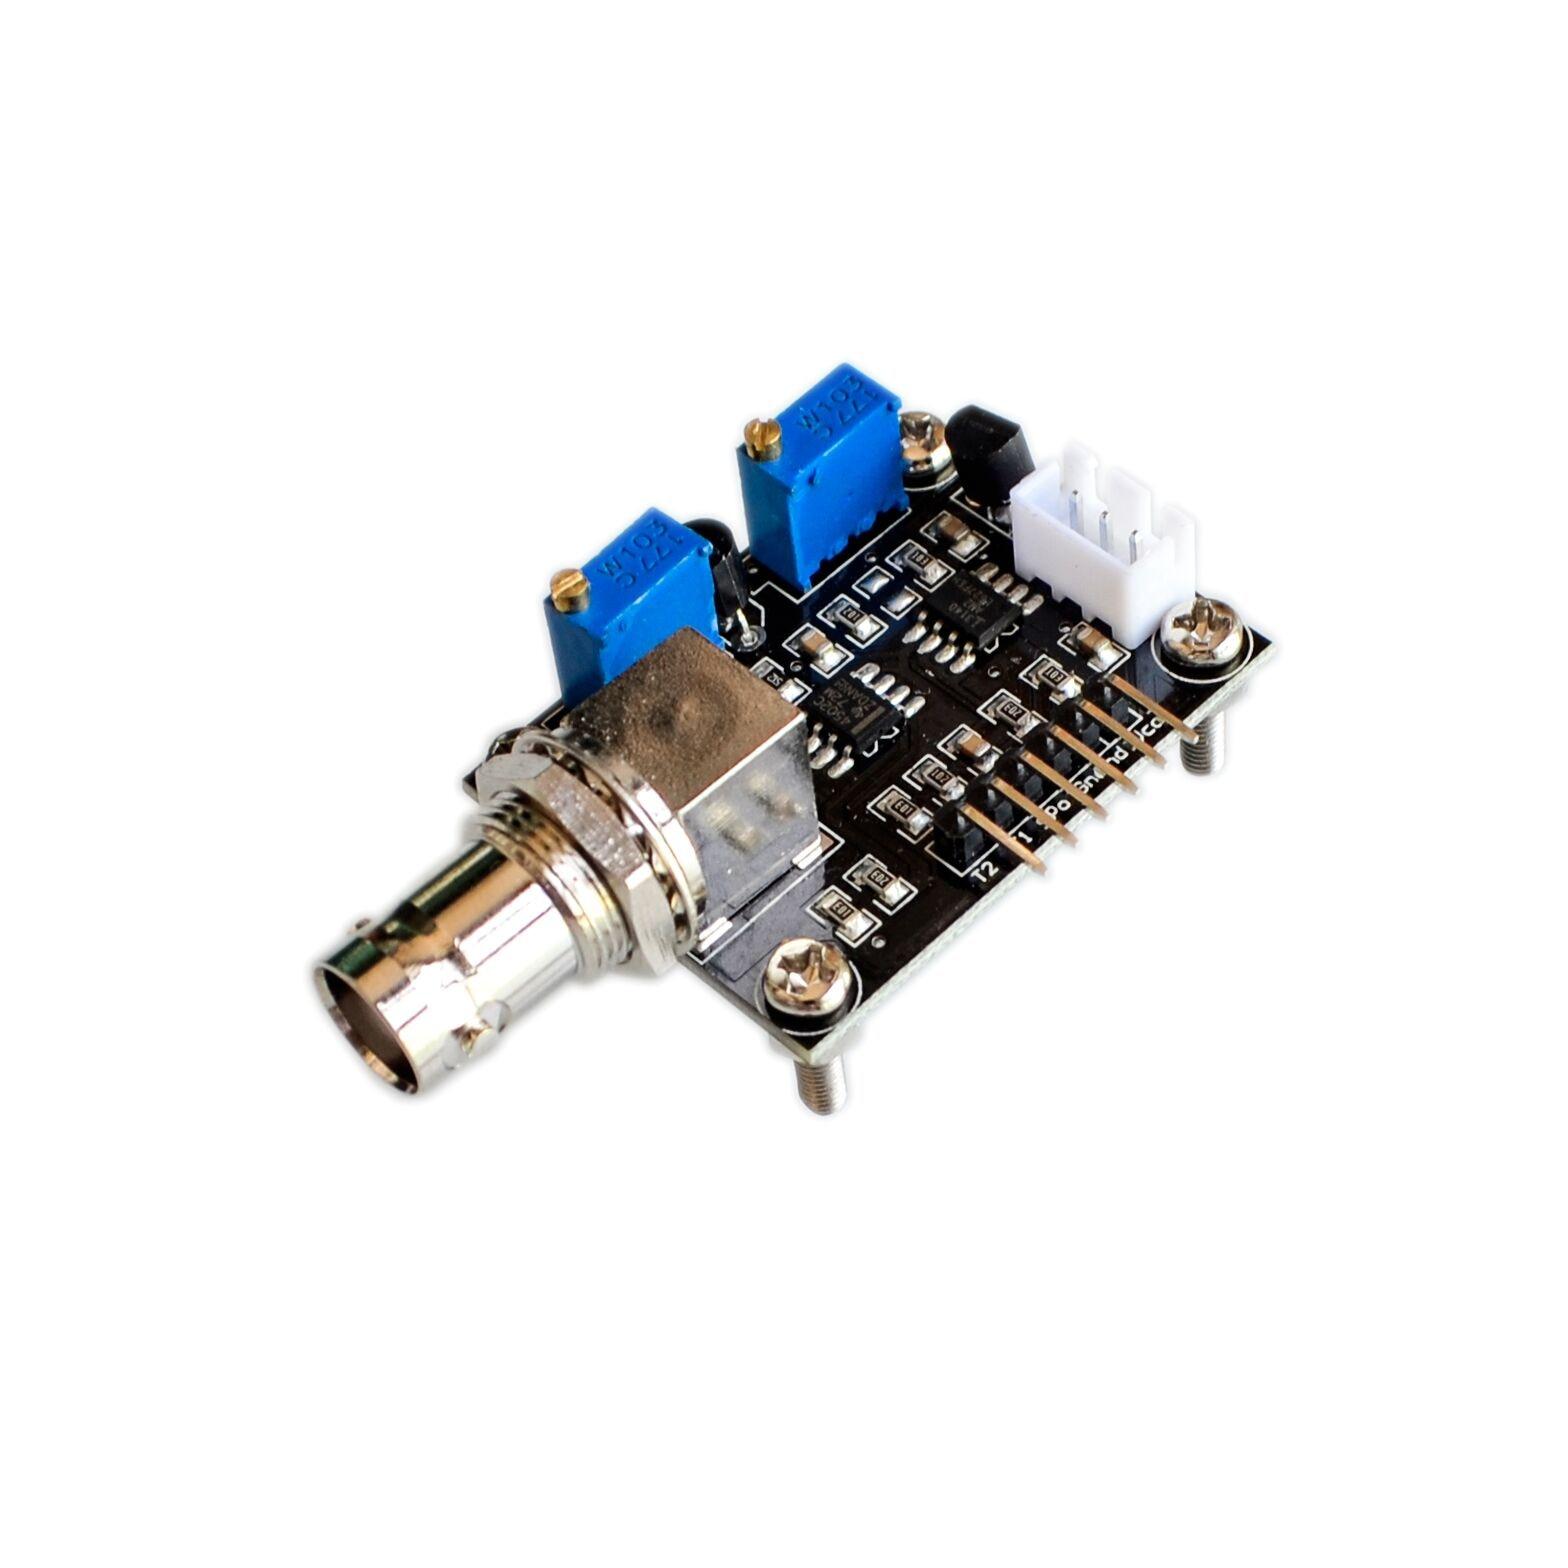 For Arduino Ph Value Measurement With Electrode Sensor Circuit Sale Detection Detect Regulator Module Monitoring Control Meter Tester 0 14